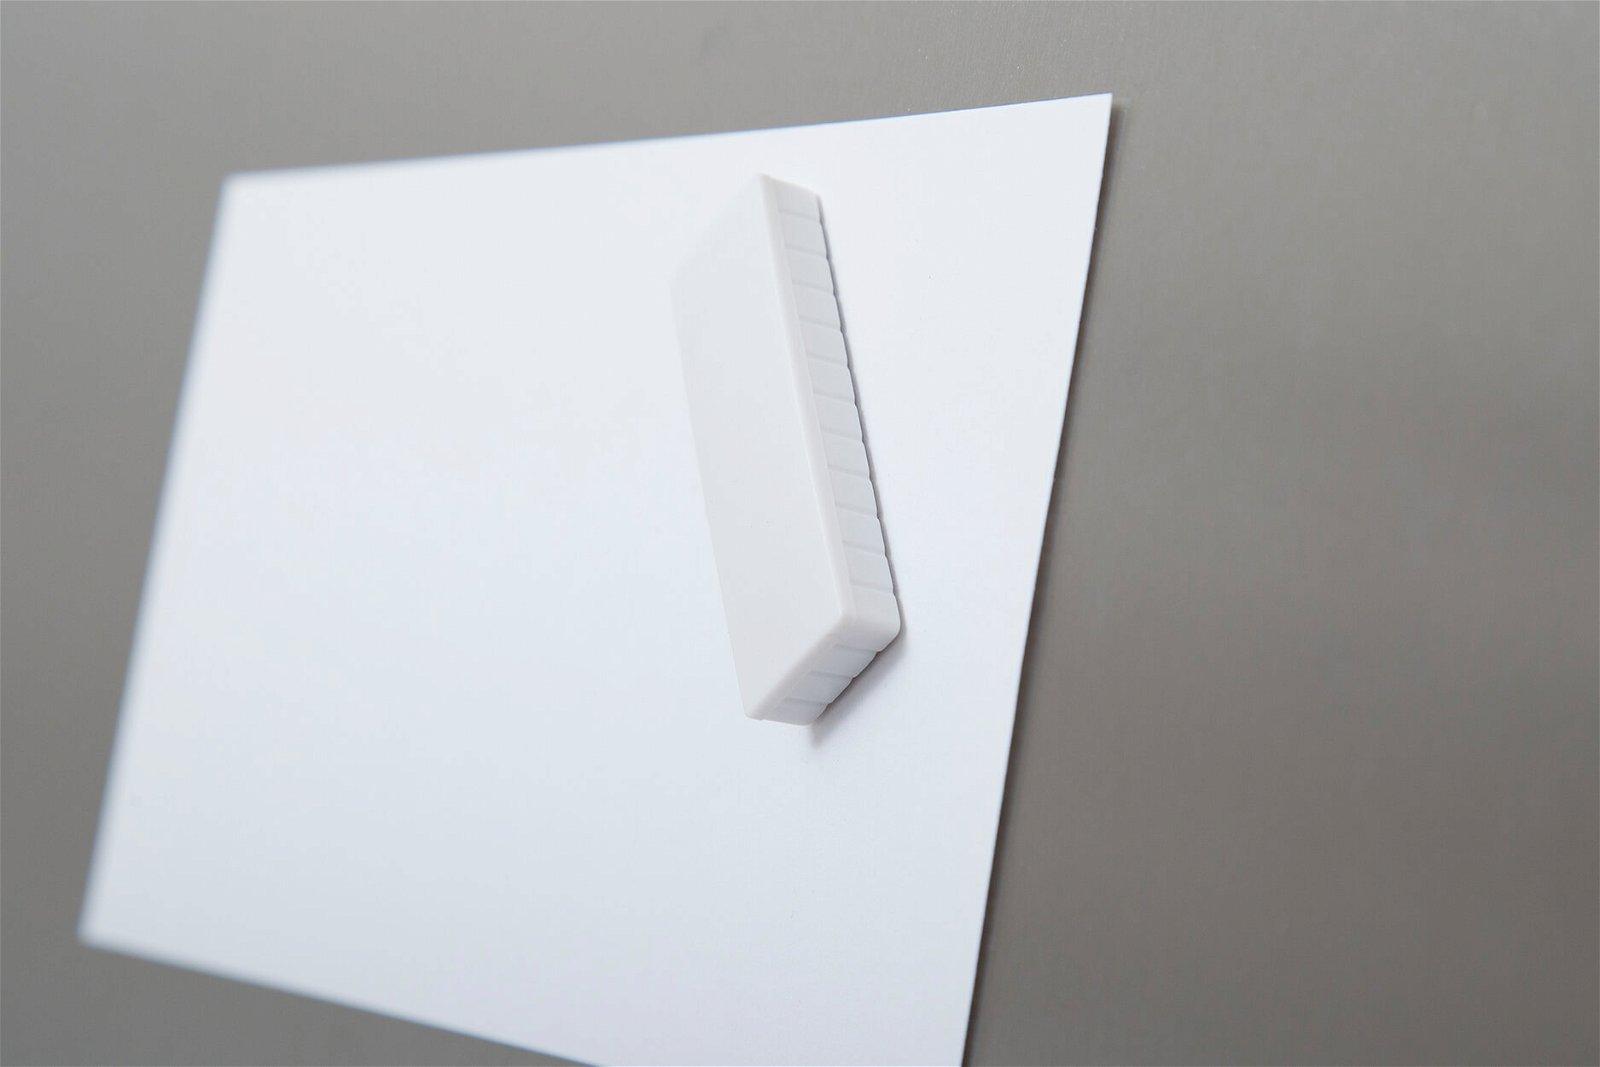 Magnet MAULsolid 54 x 19 mm, 1 kg Haftkraft, 10 St./Ktn., weiß